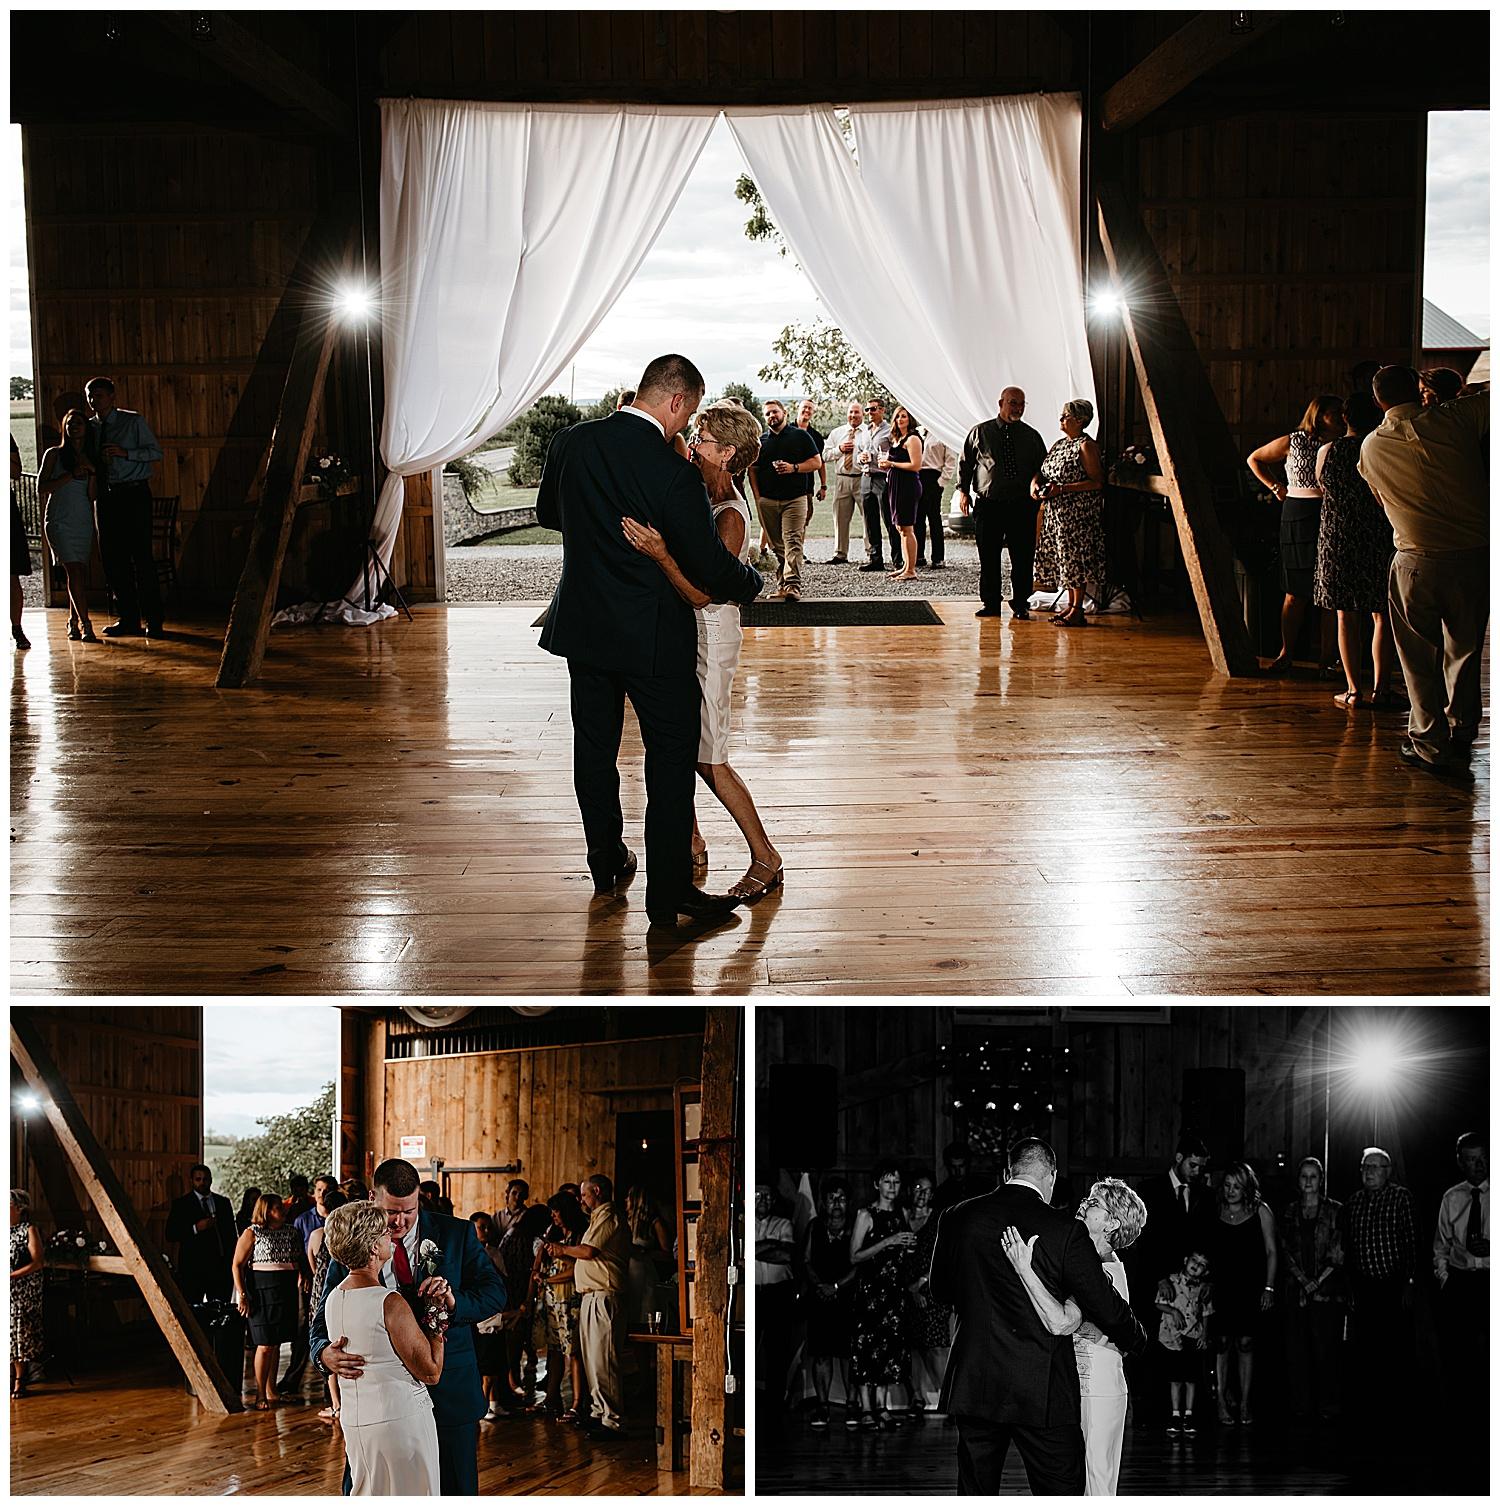 NEPA-Bloomgsburg-Wedding-Photographer-at-The-Barn-at-Greystone-Farms-Watsontown-PA_0091.jpg